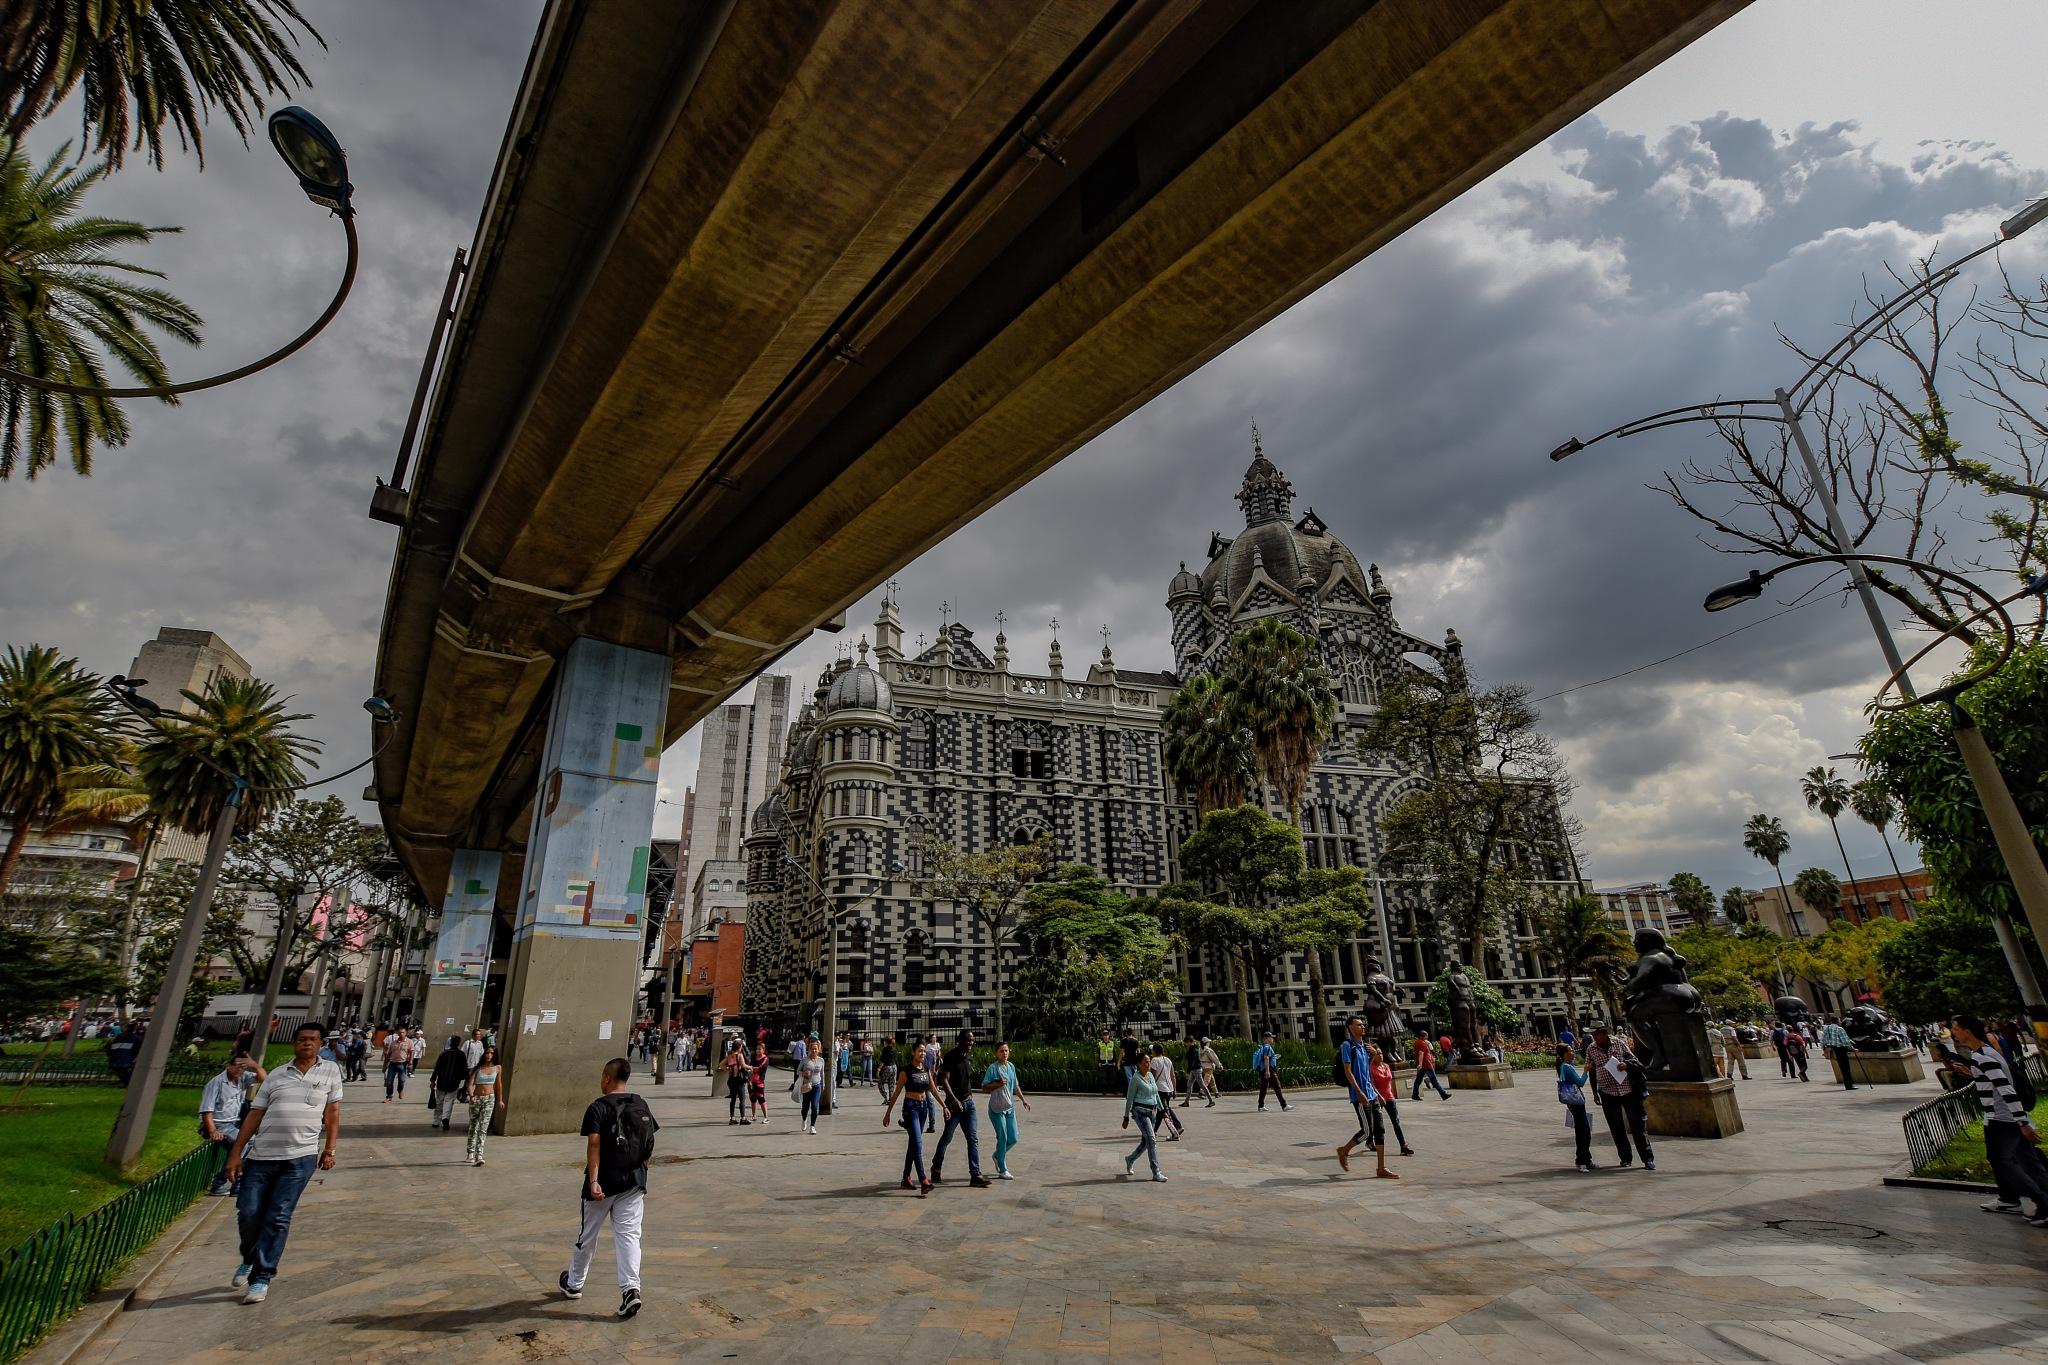 Basílica Candelaria, Medellin  by Ben Leeuwenburgh